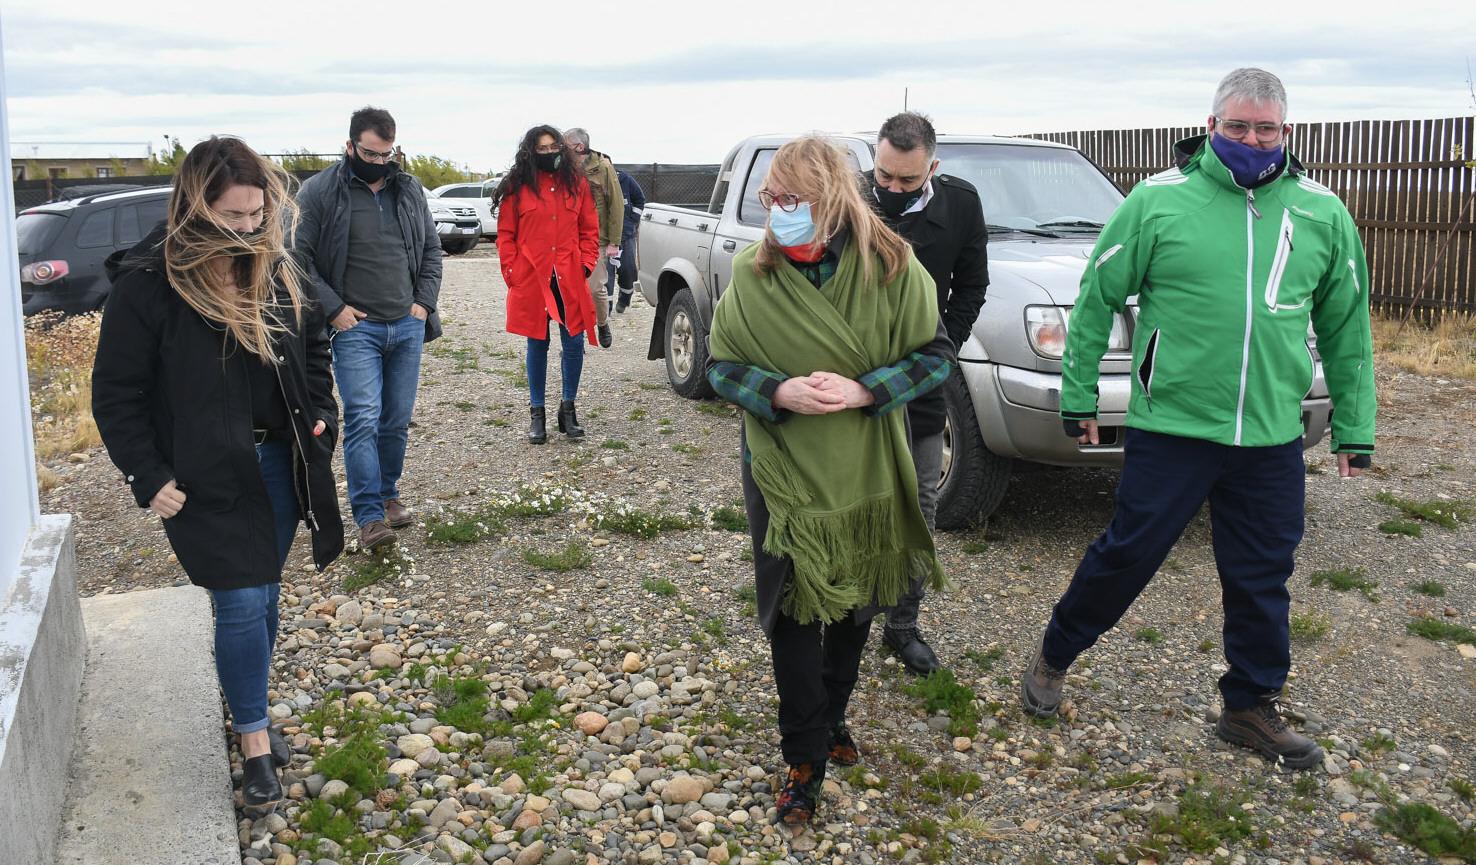 De Izq. a Der. Belén García, Alicia Kirchner, Leonardo Álvarez y Raúl Meló. FOTO: PRENSA DE GOBIERNO